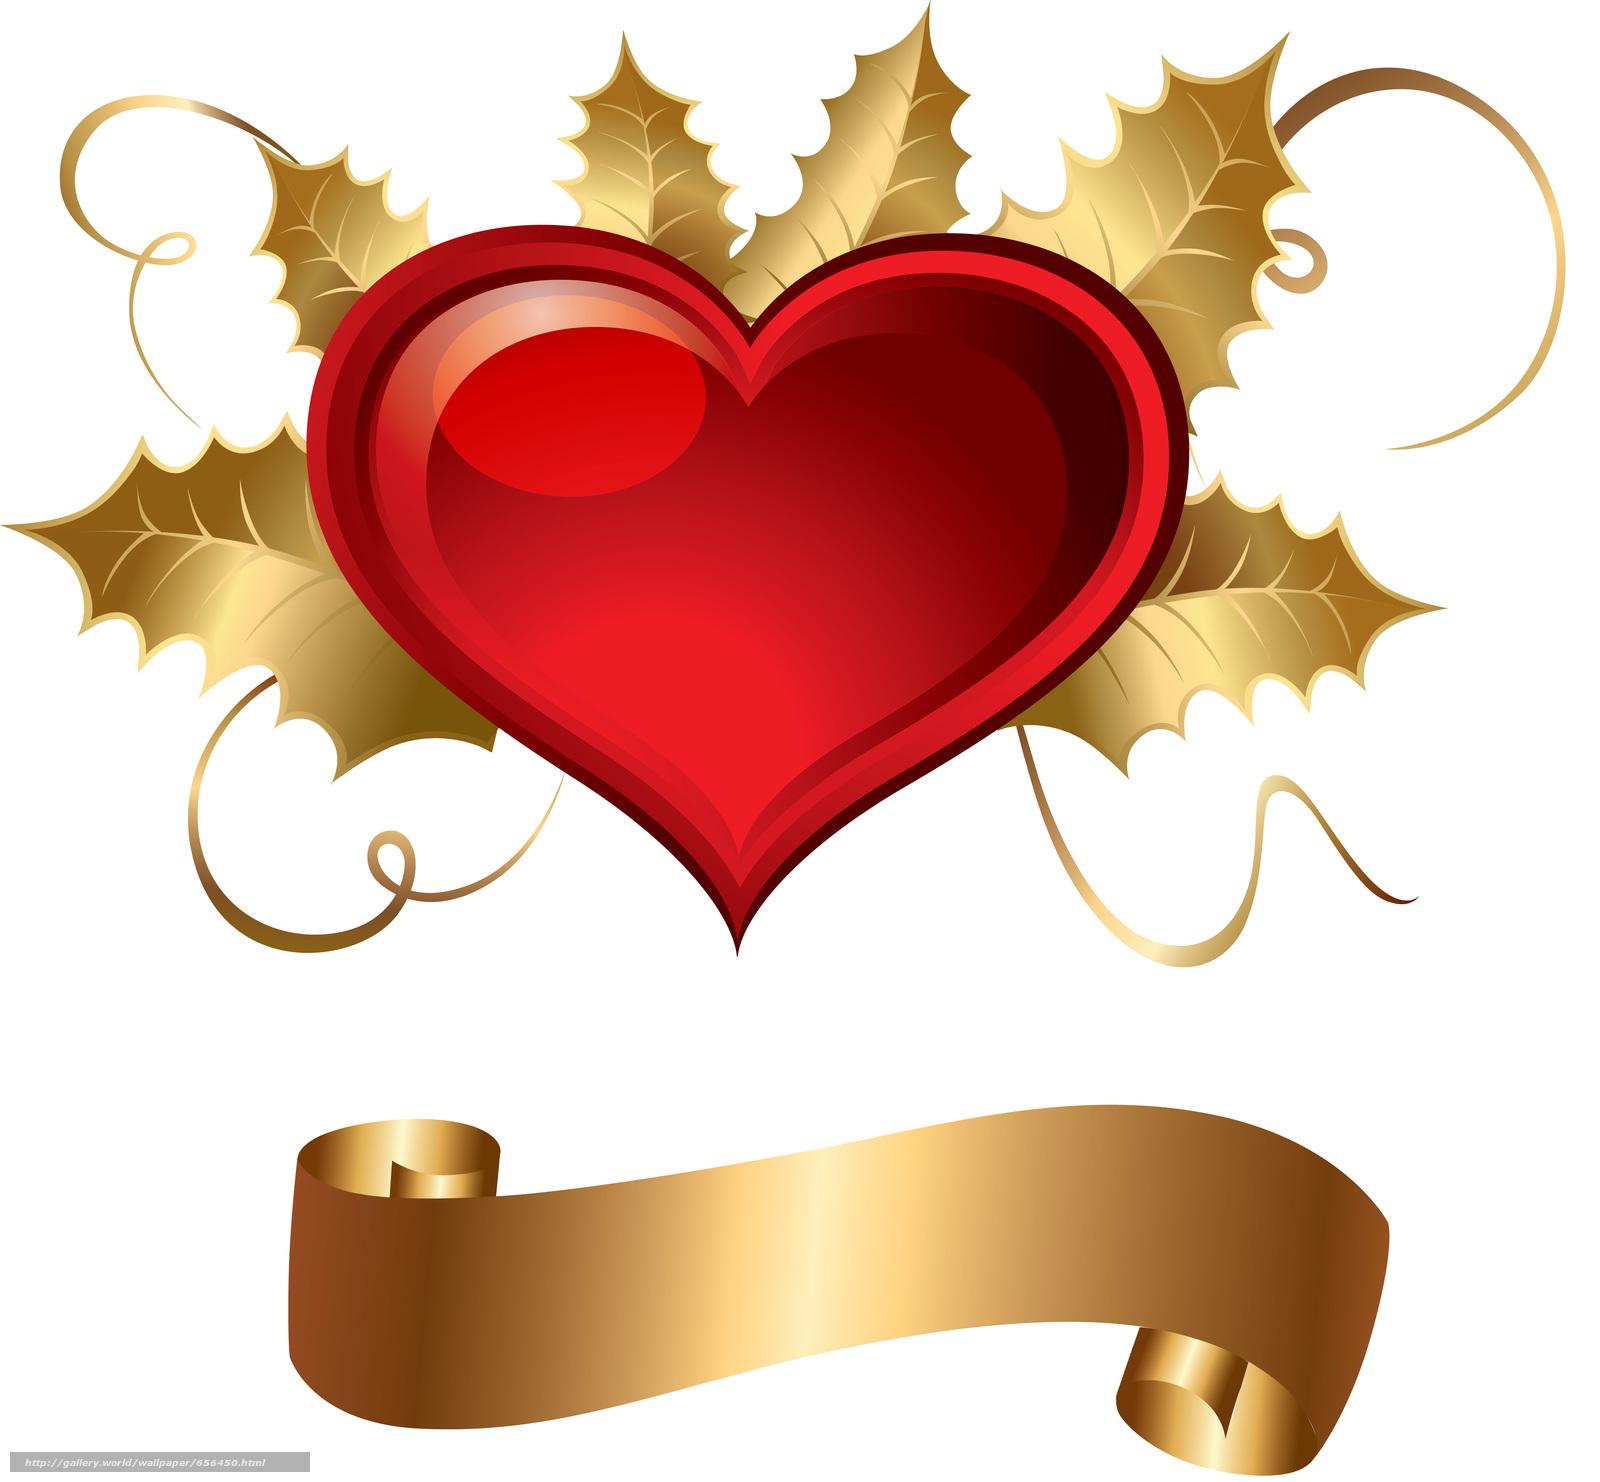 Открытки к дню святого Валентина картинки валентинки